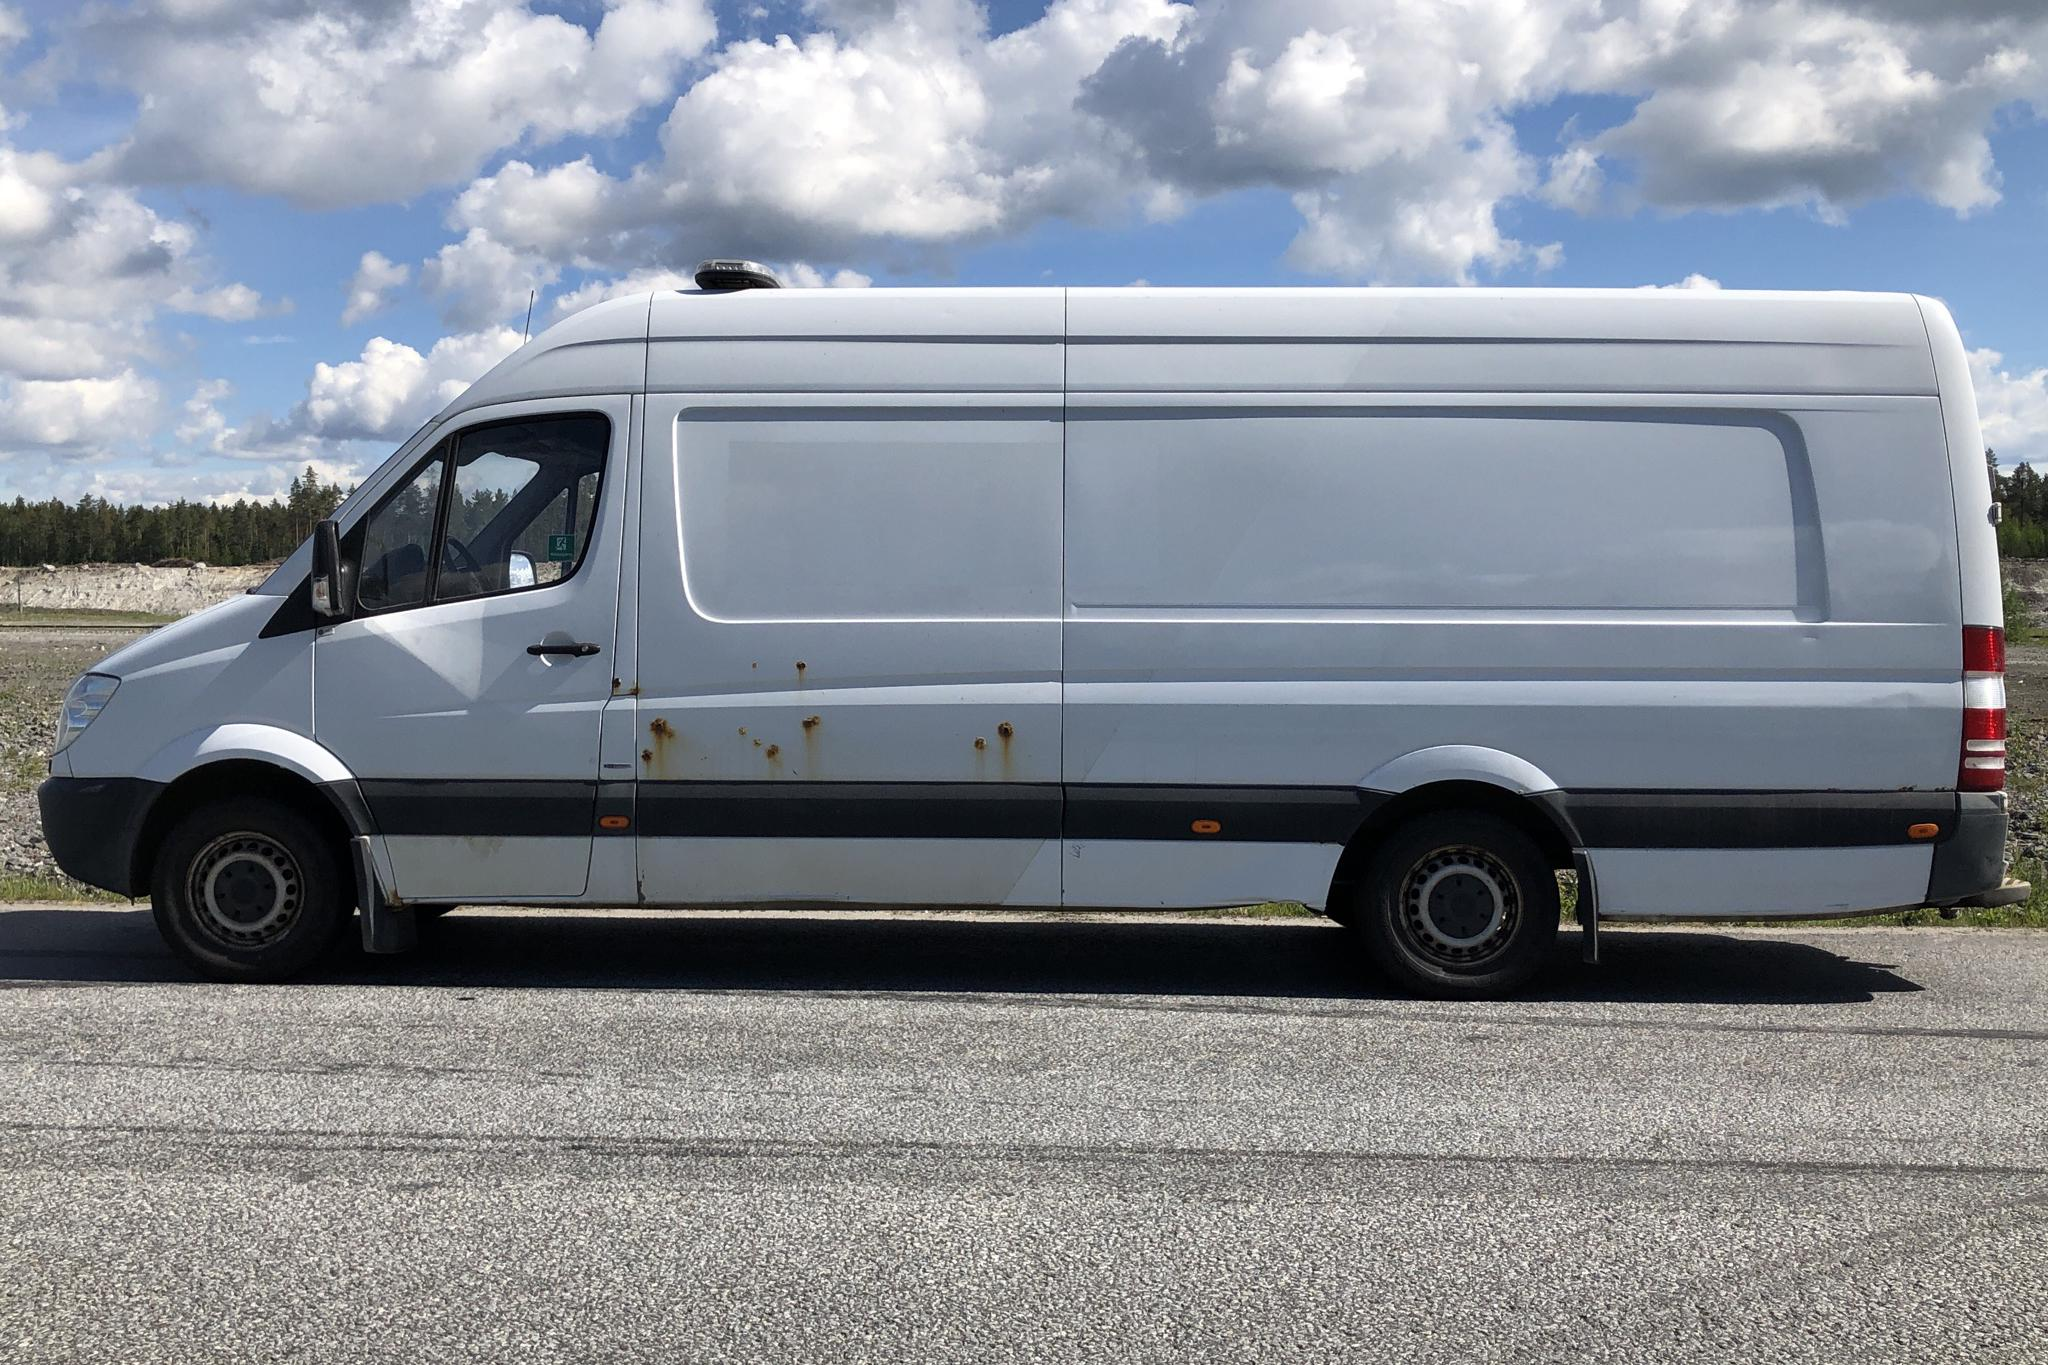 Mercedes Sprinter 316 CDI (163hk) - 402 980 km - Automatic - white - 2013